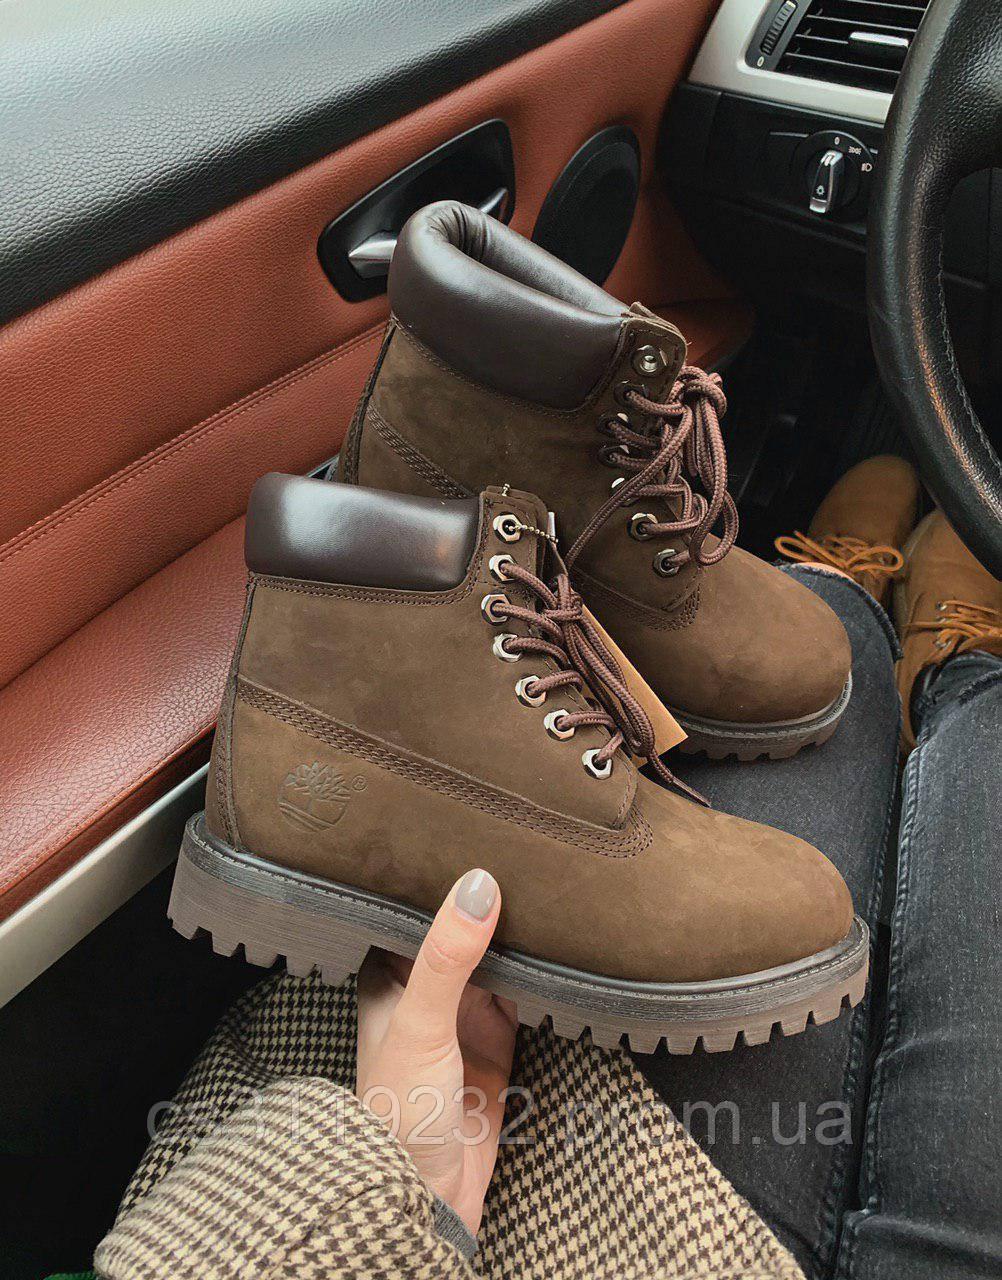 Женские ботинки зимние Timberland (мех) (коричневые)